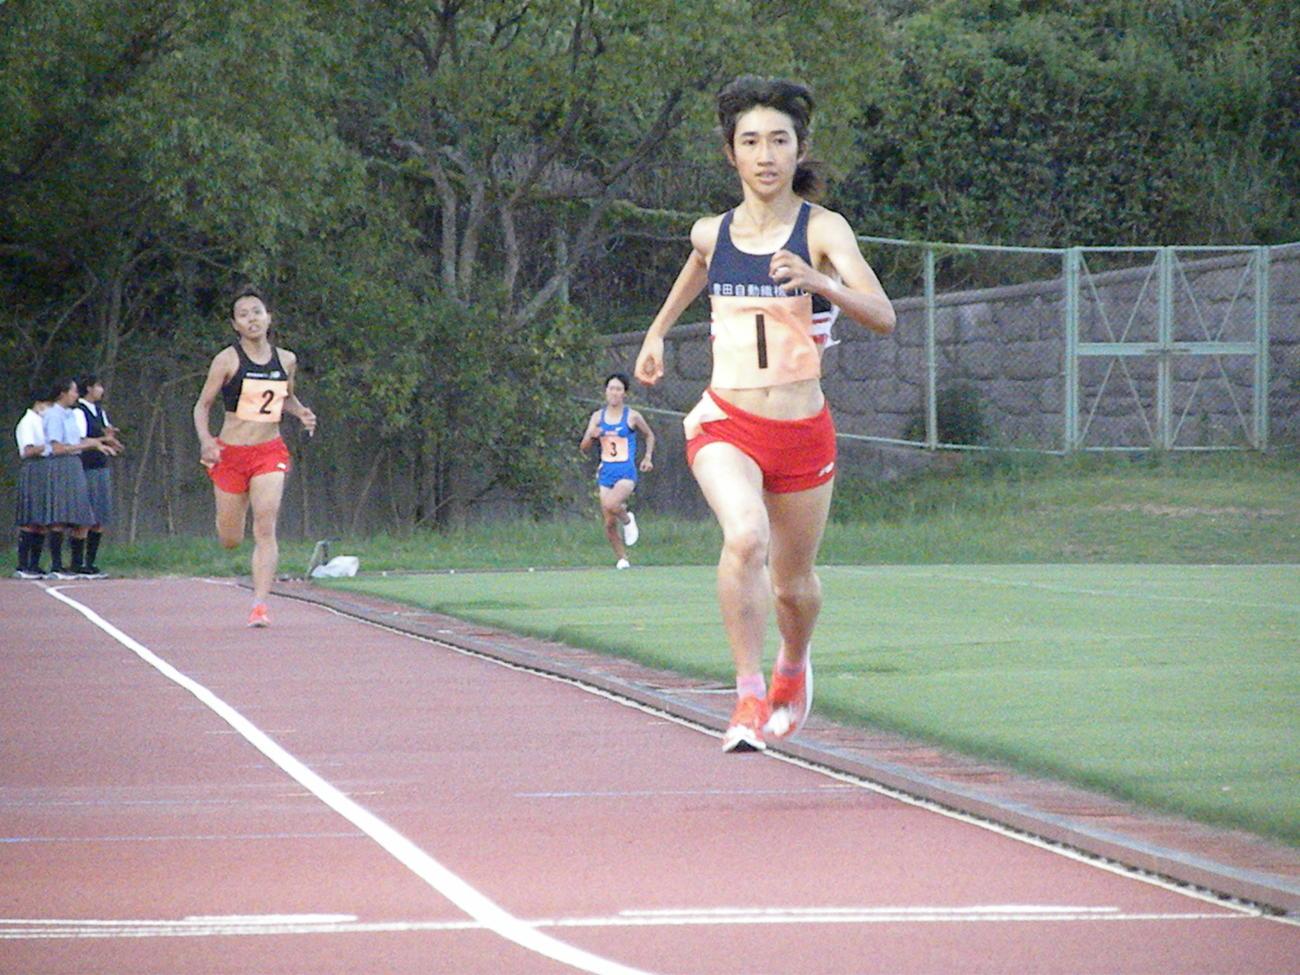 神戸市長距離記録会女子1500メートルで力走する田中希実(撮影・松本航)